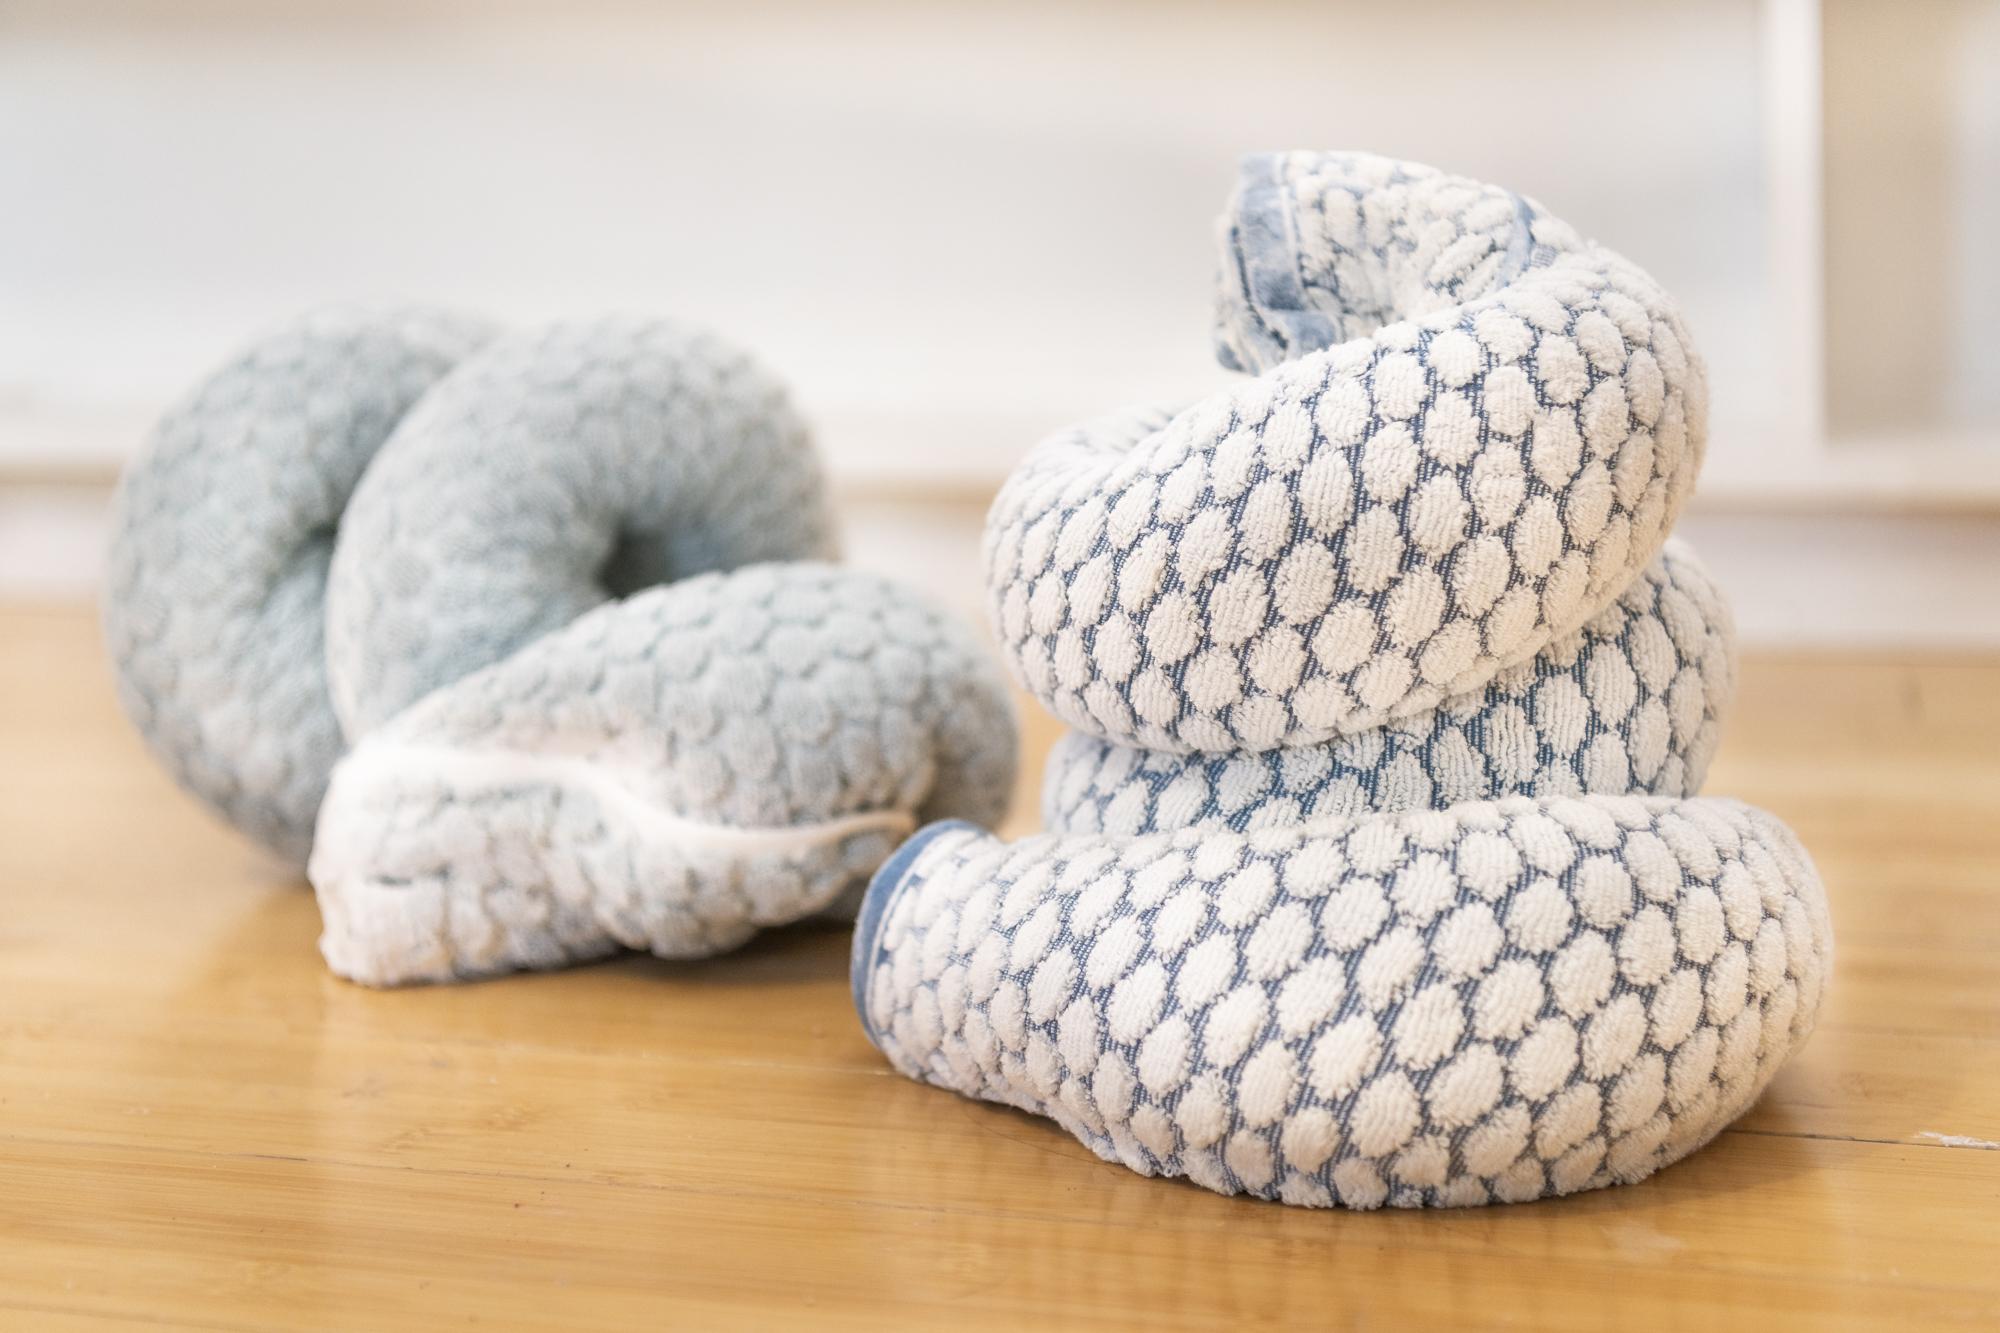 Oren Pinhassi,  Towel Snake (white & blue II) , 2016, bath towel, plaster